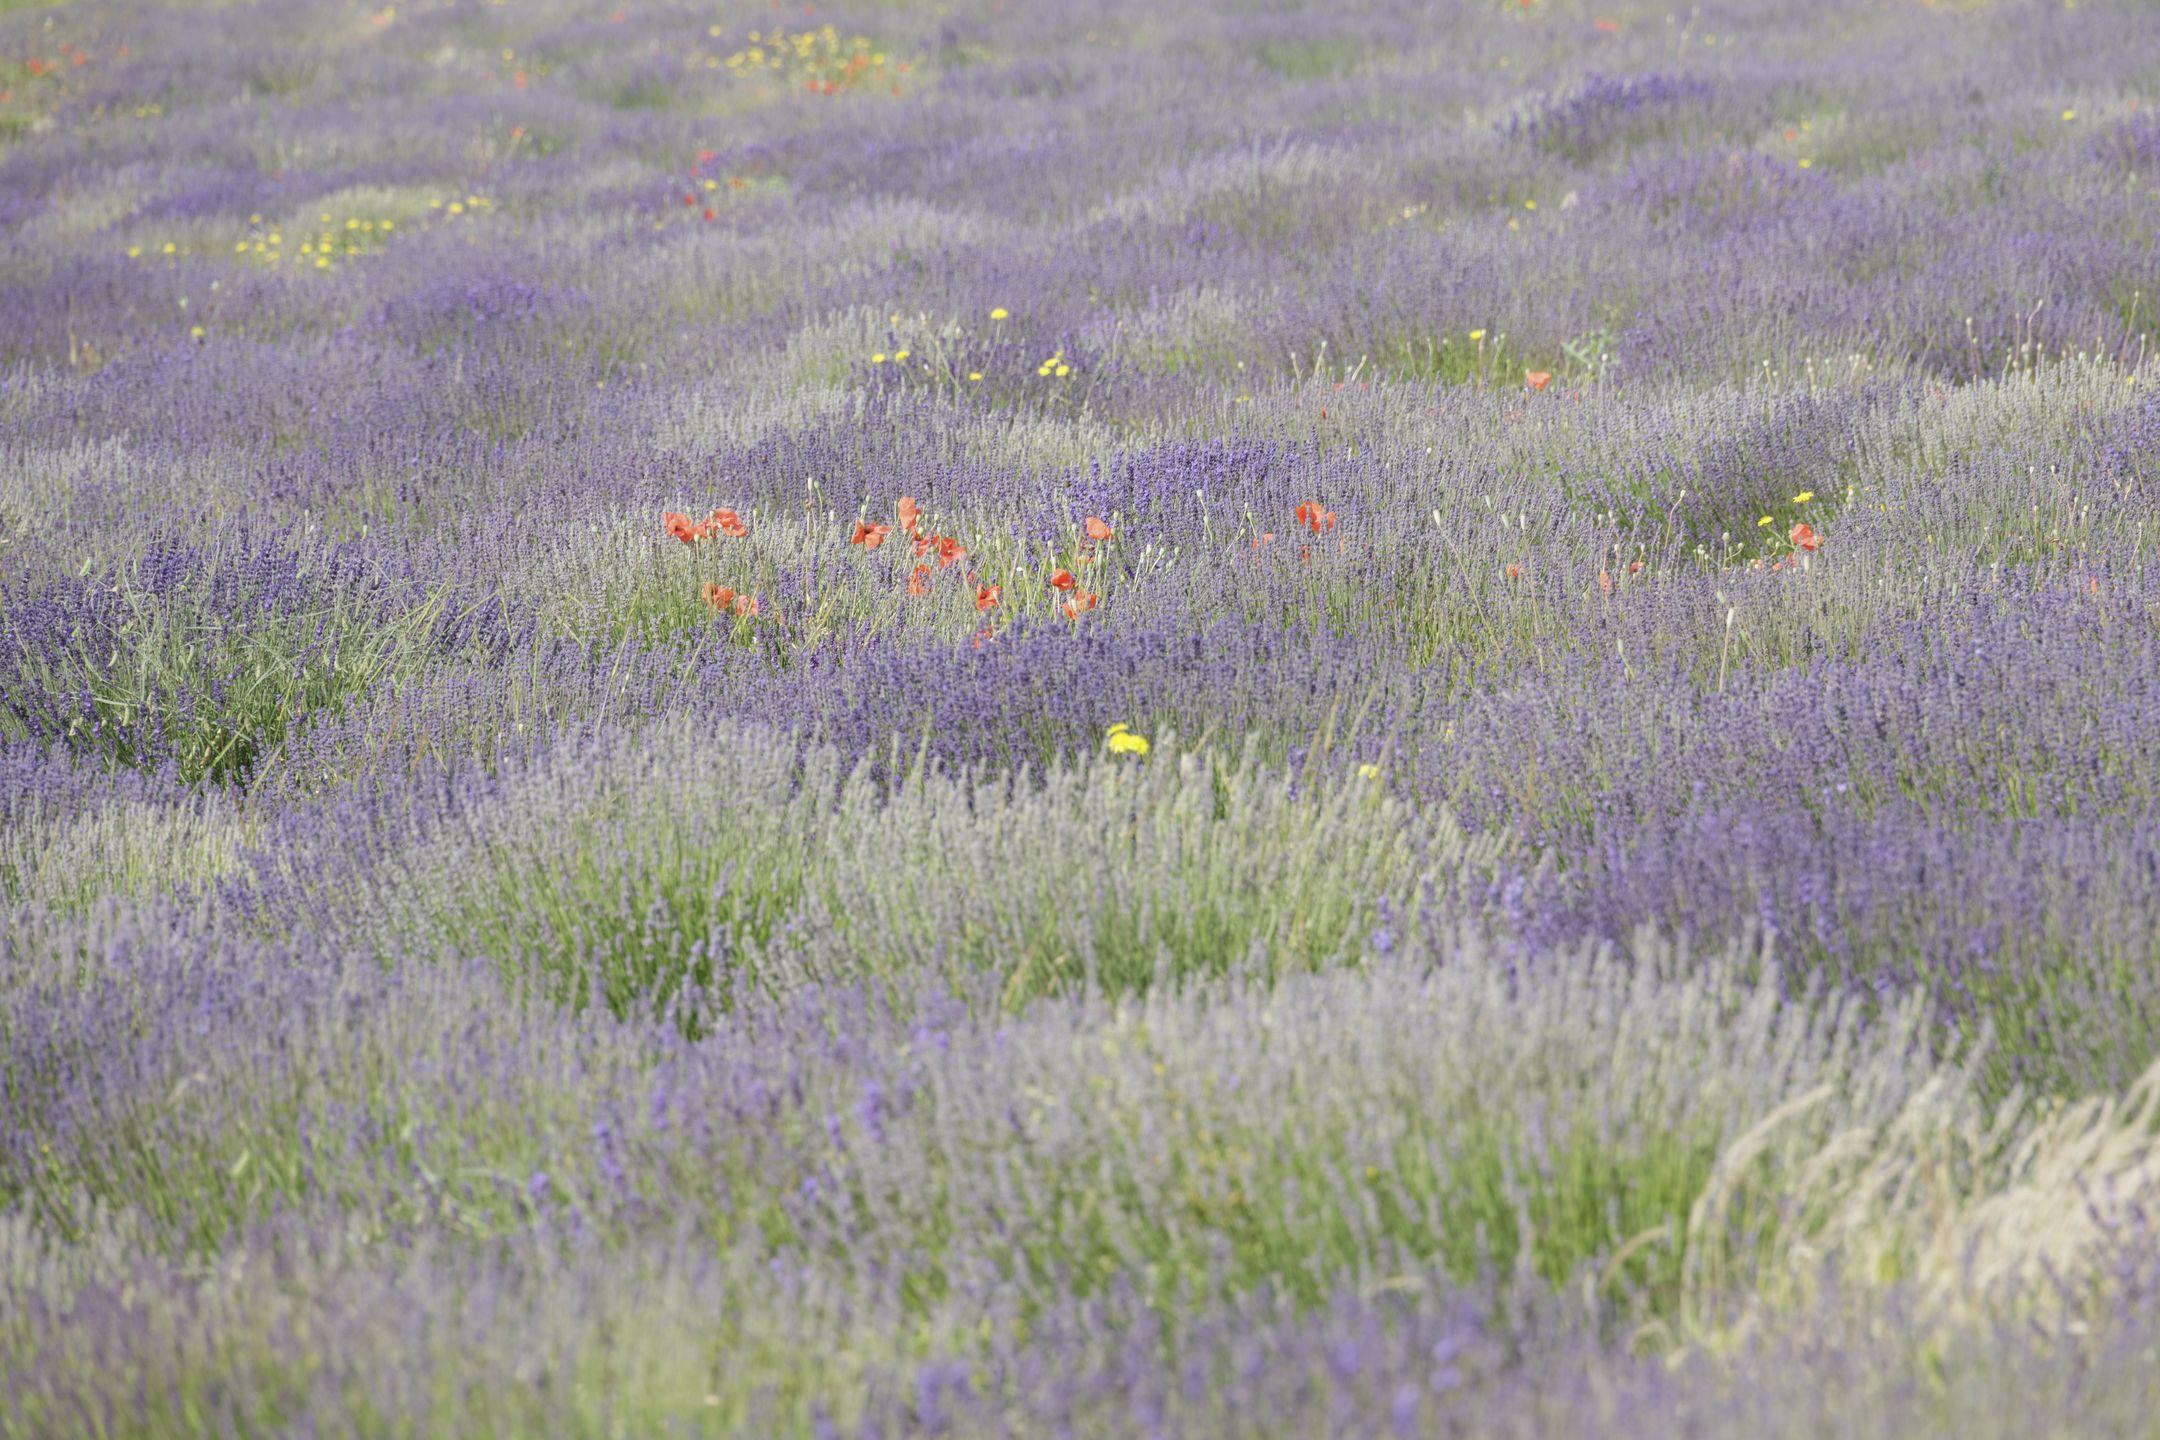 20210628-Provence-10-05-34-023